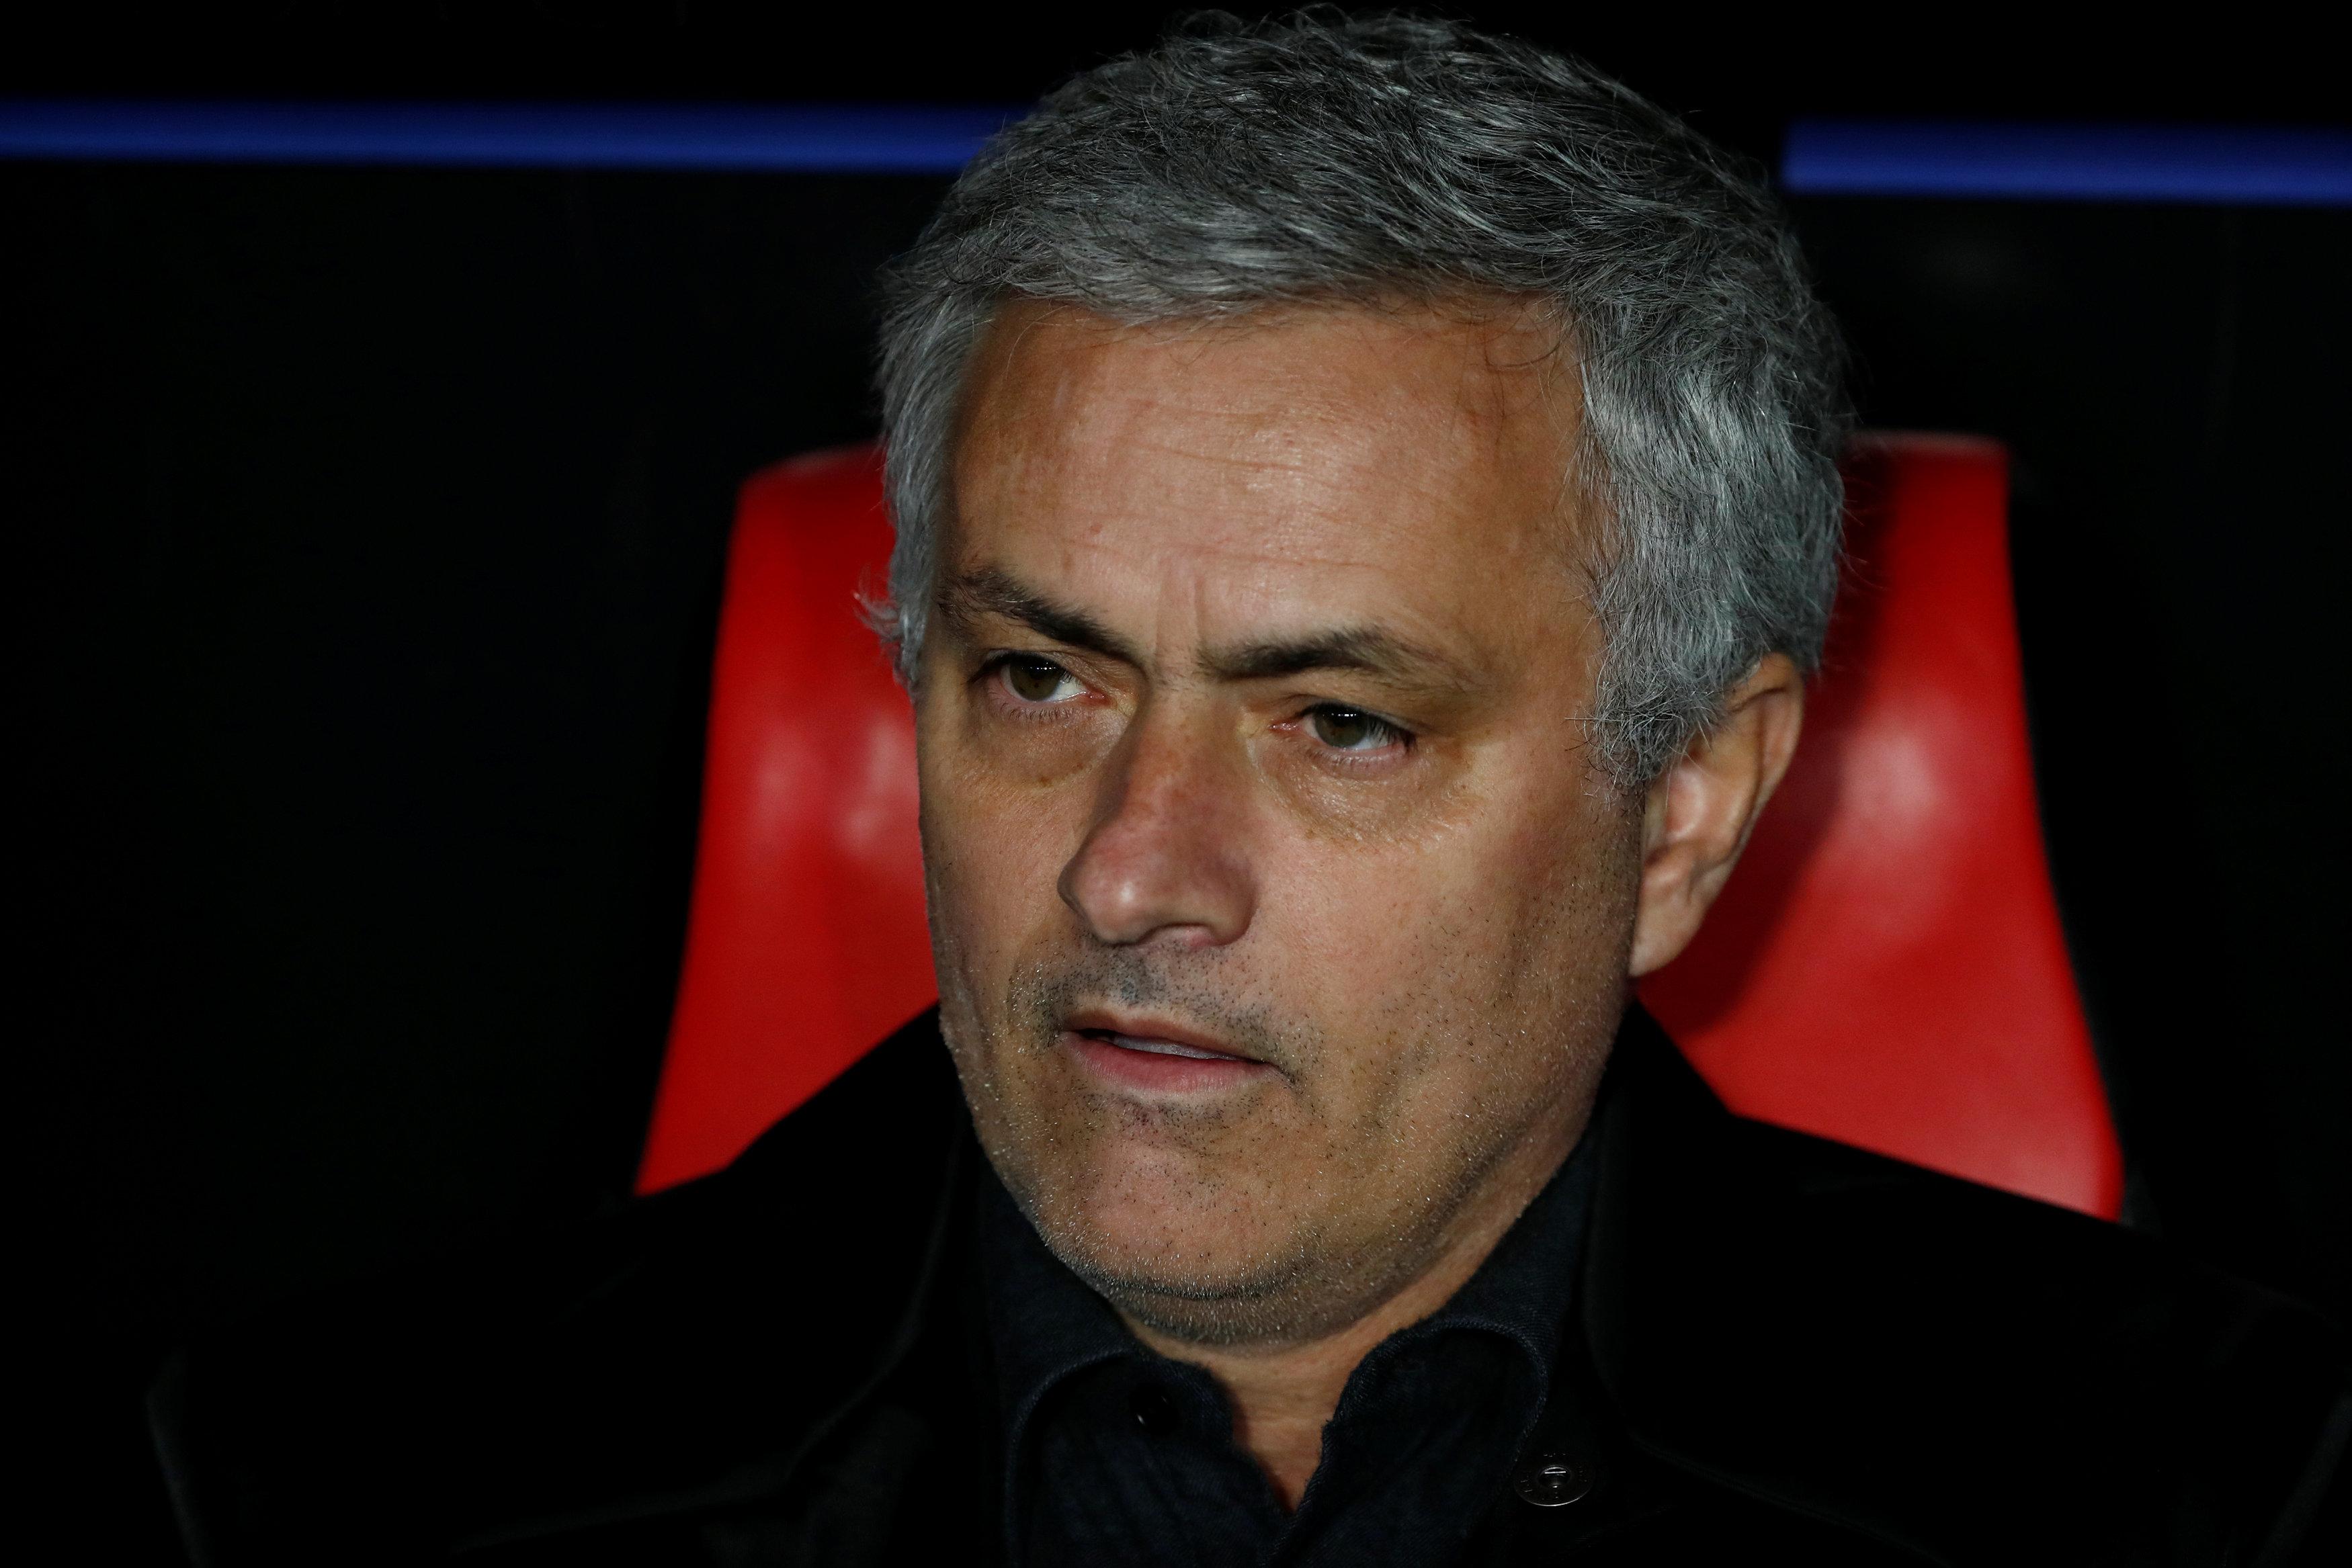 Football: Mourinho forecasts 'amazing' period for United